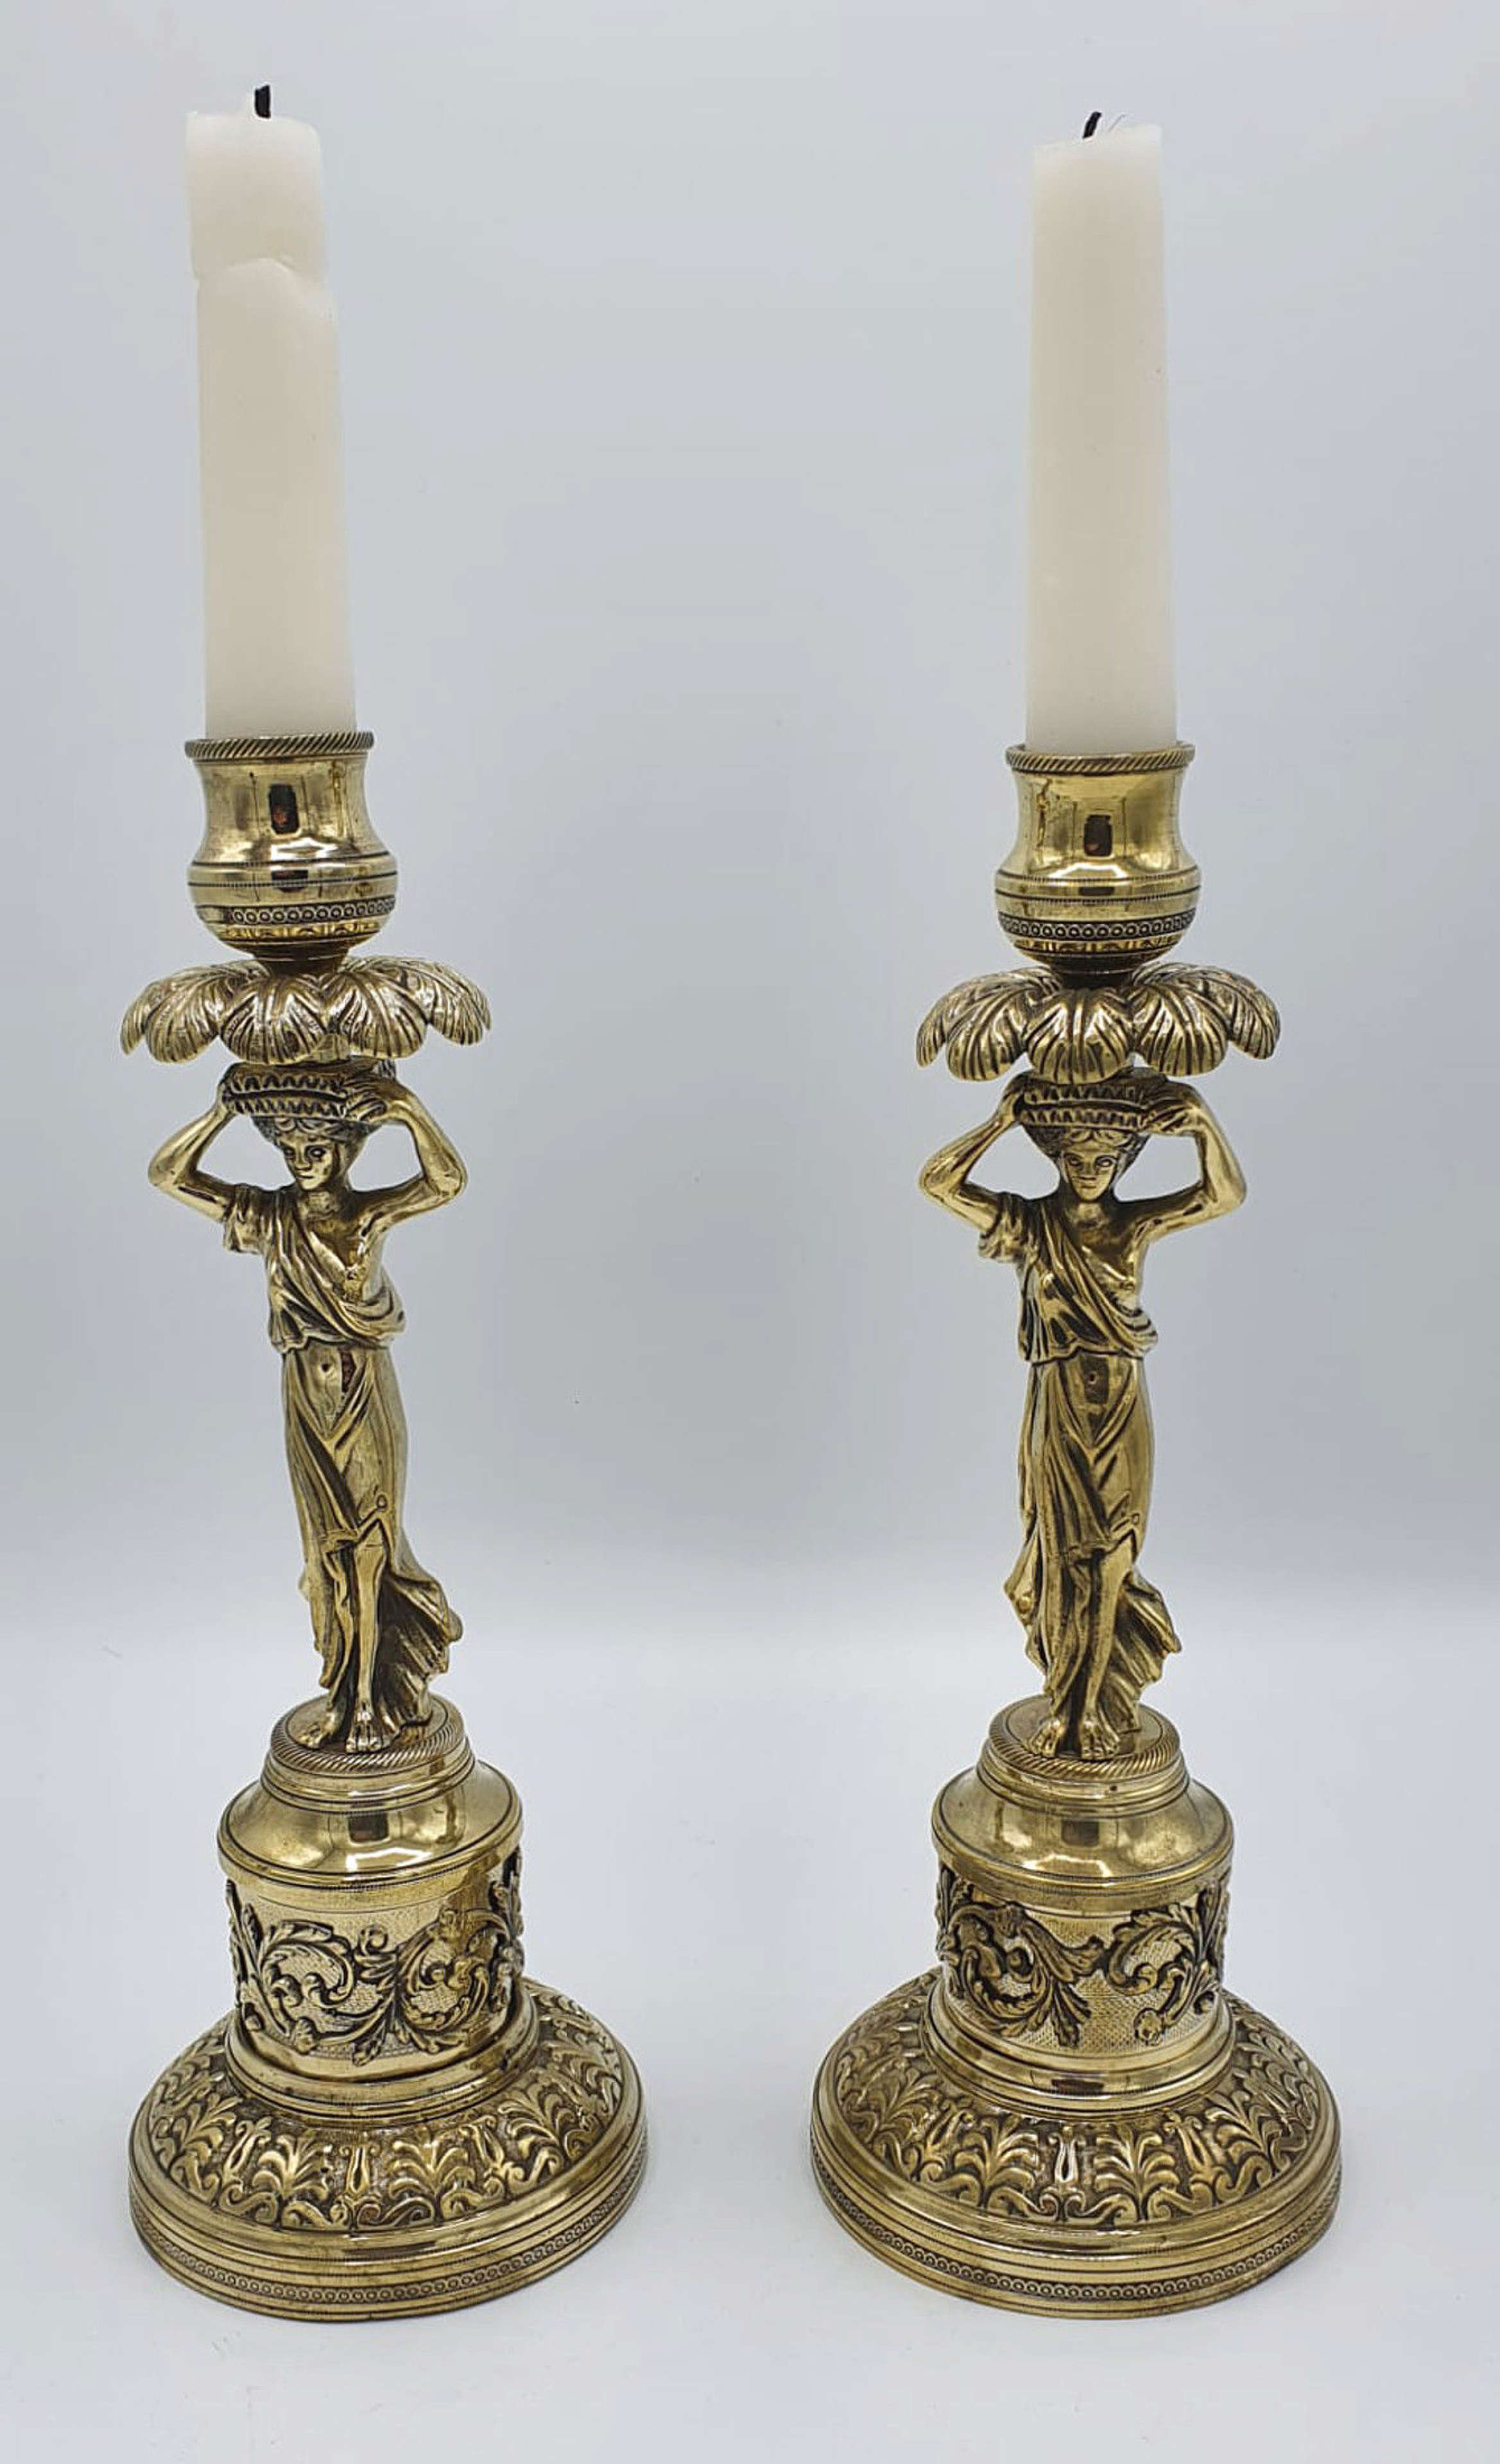 Pair of Heavy 19th Century Brass Candlesticks